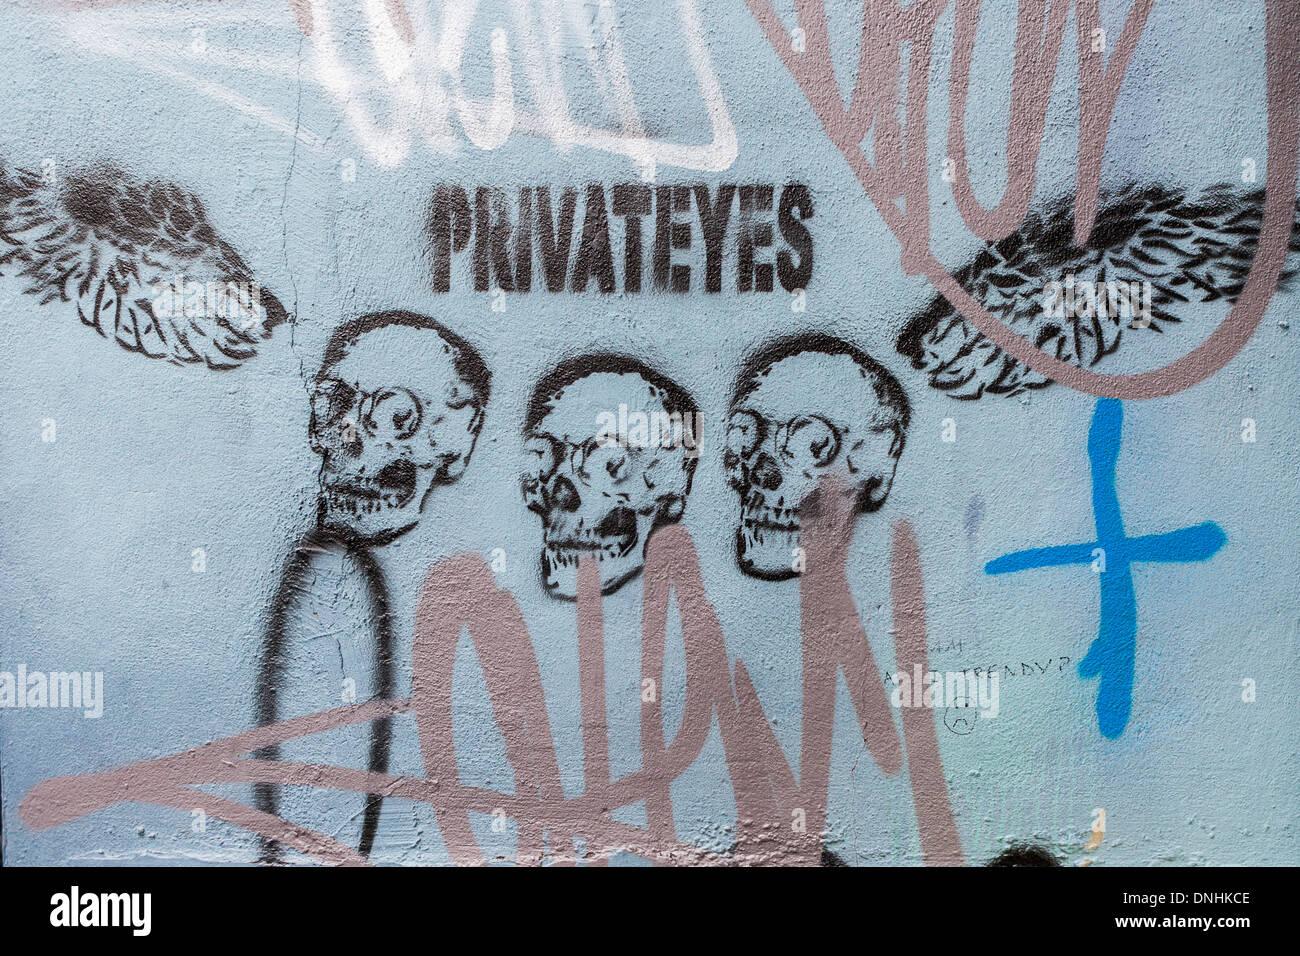 Street stencil art 'Private Eyes' - Three skulls and wings Heneage street - Brick lane, East London, UK - Stock Image